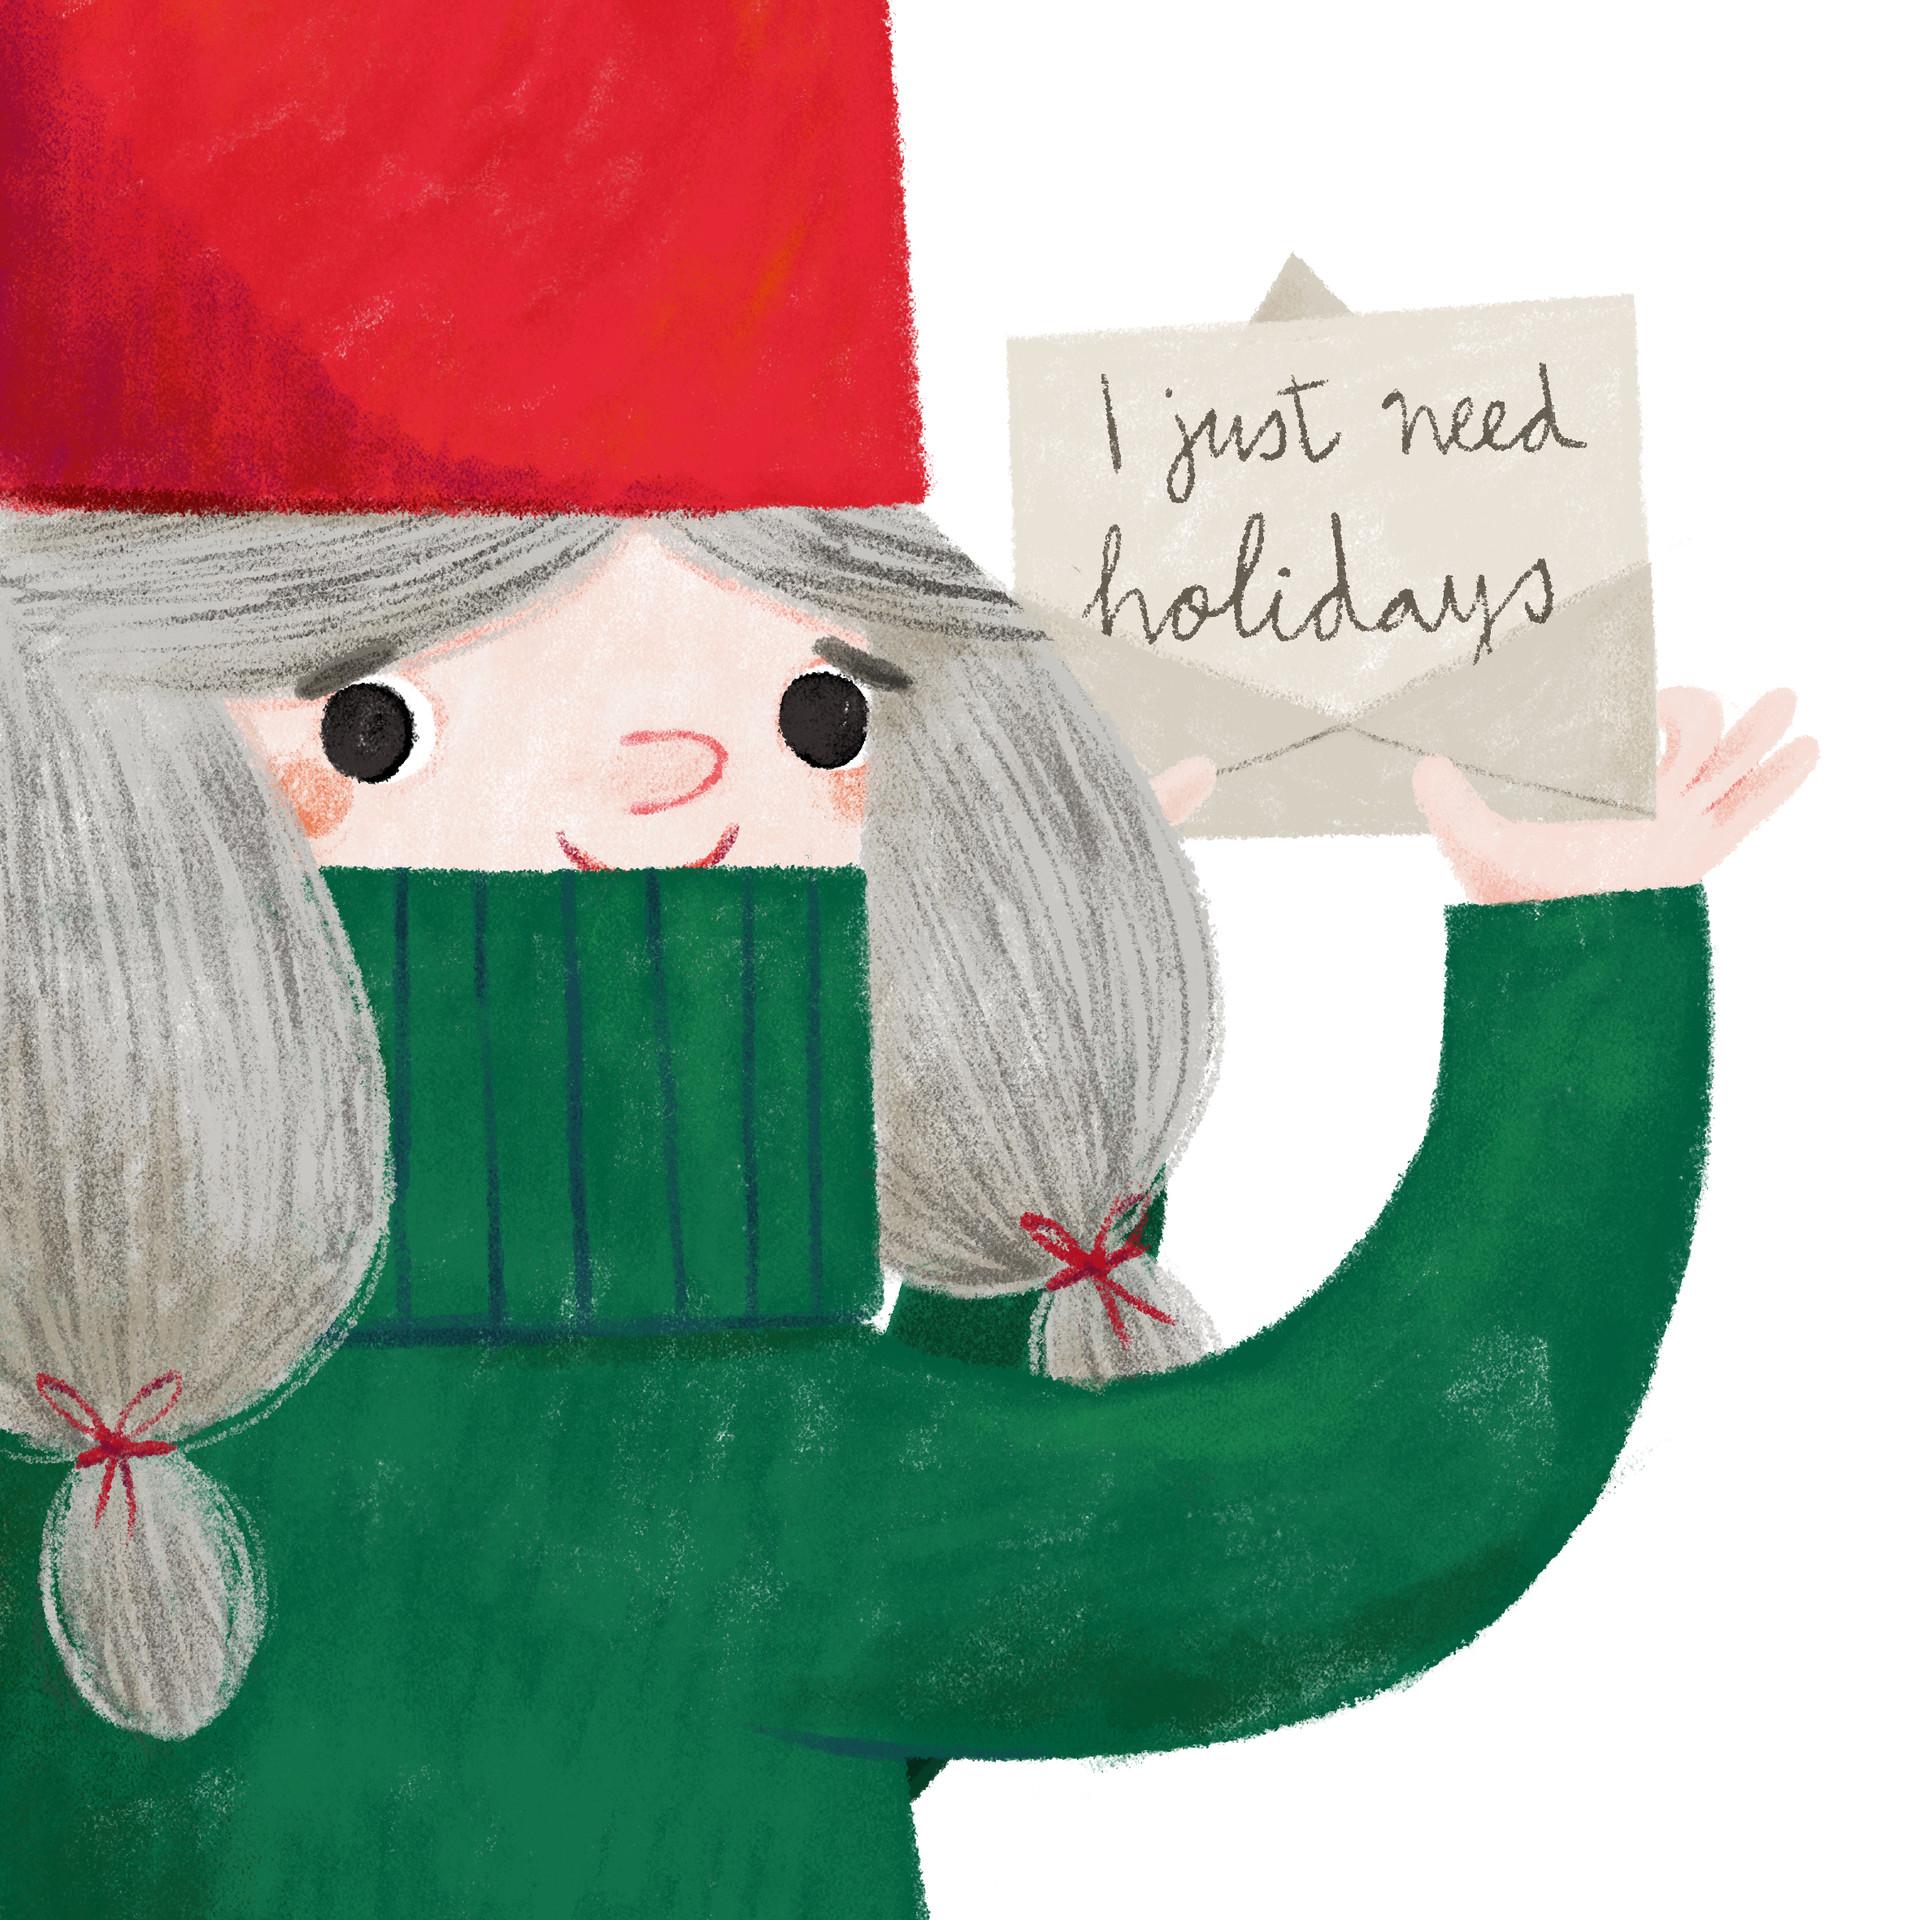 #2 Write a letter to Santa